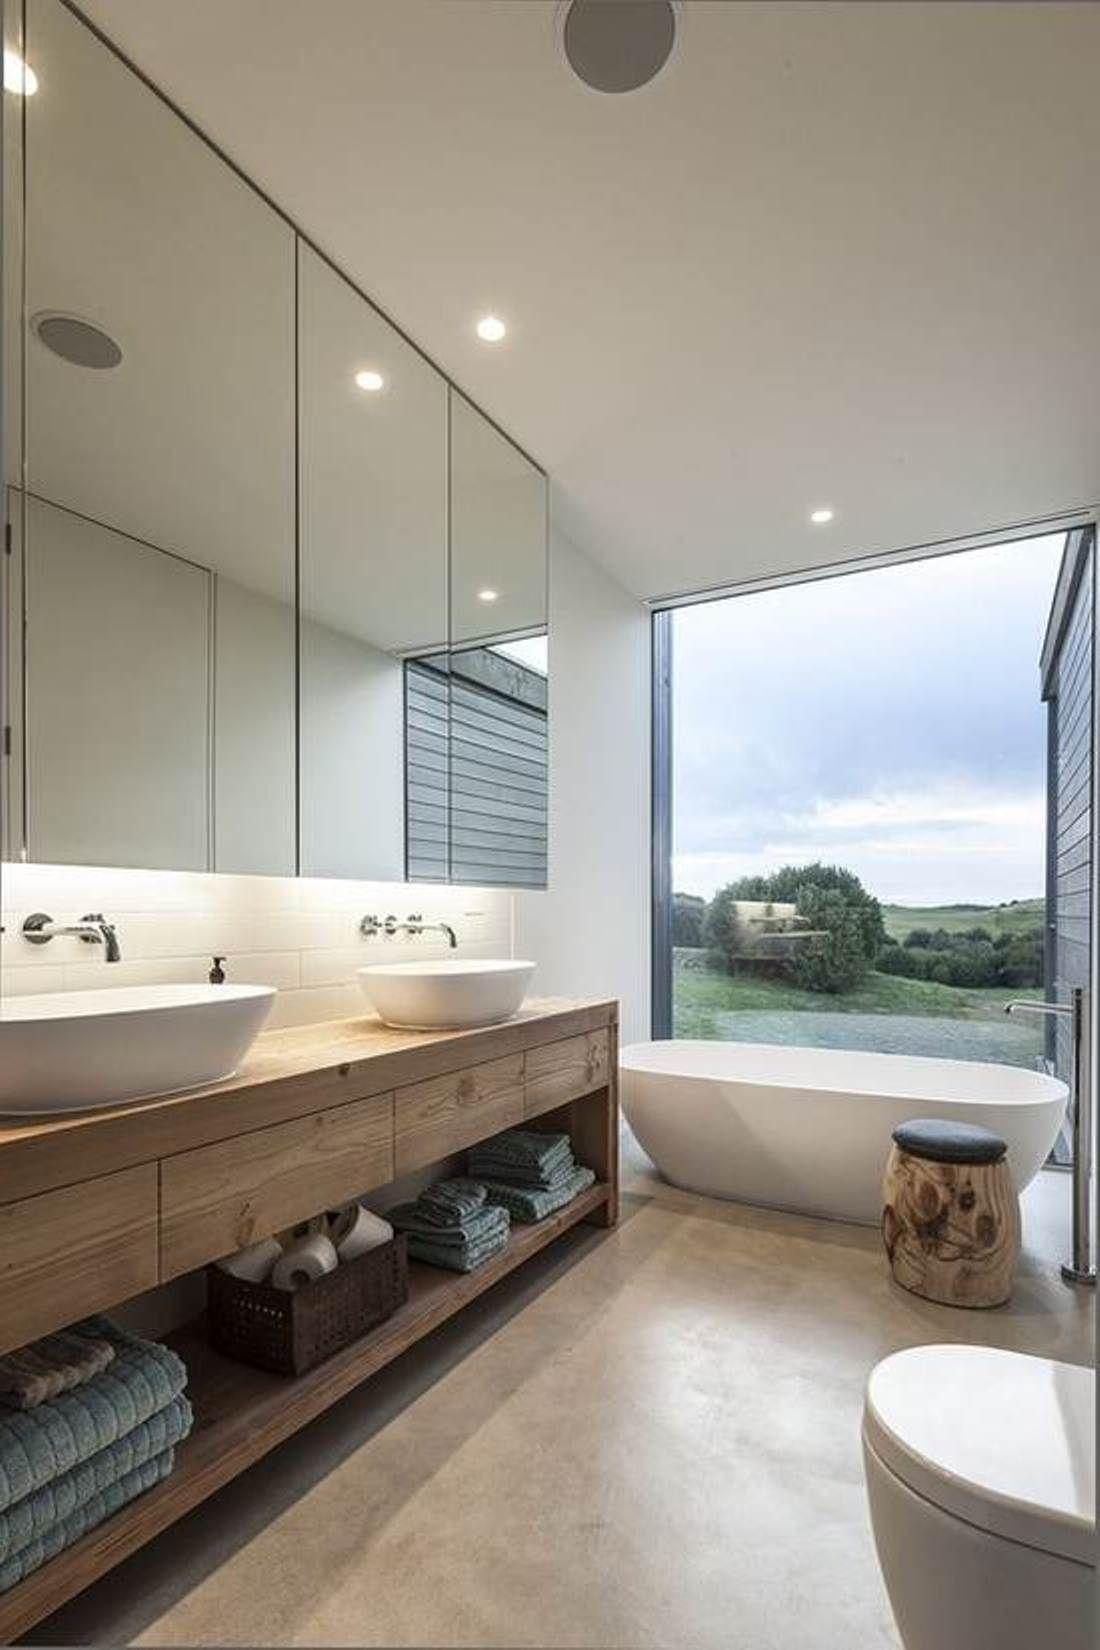 Ideas For Small Modern Bathrooms Home Art Design Ideas And Photos Repostudio Org Led Ugh Ting Aro Modernes Badezimmerdesign Waschbeckenschrank Badezimmer